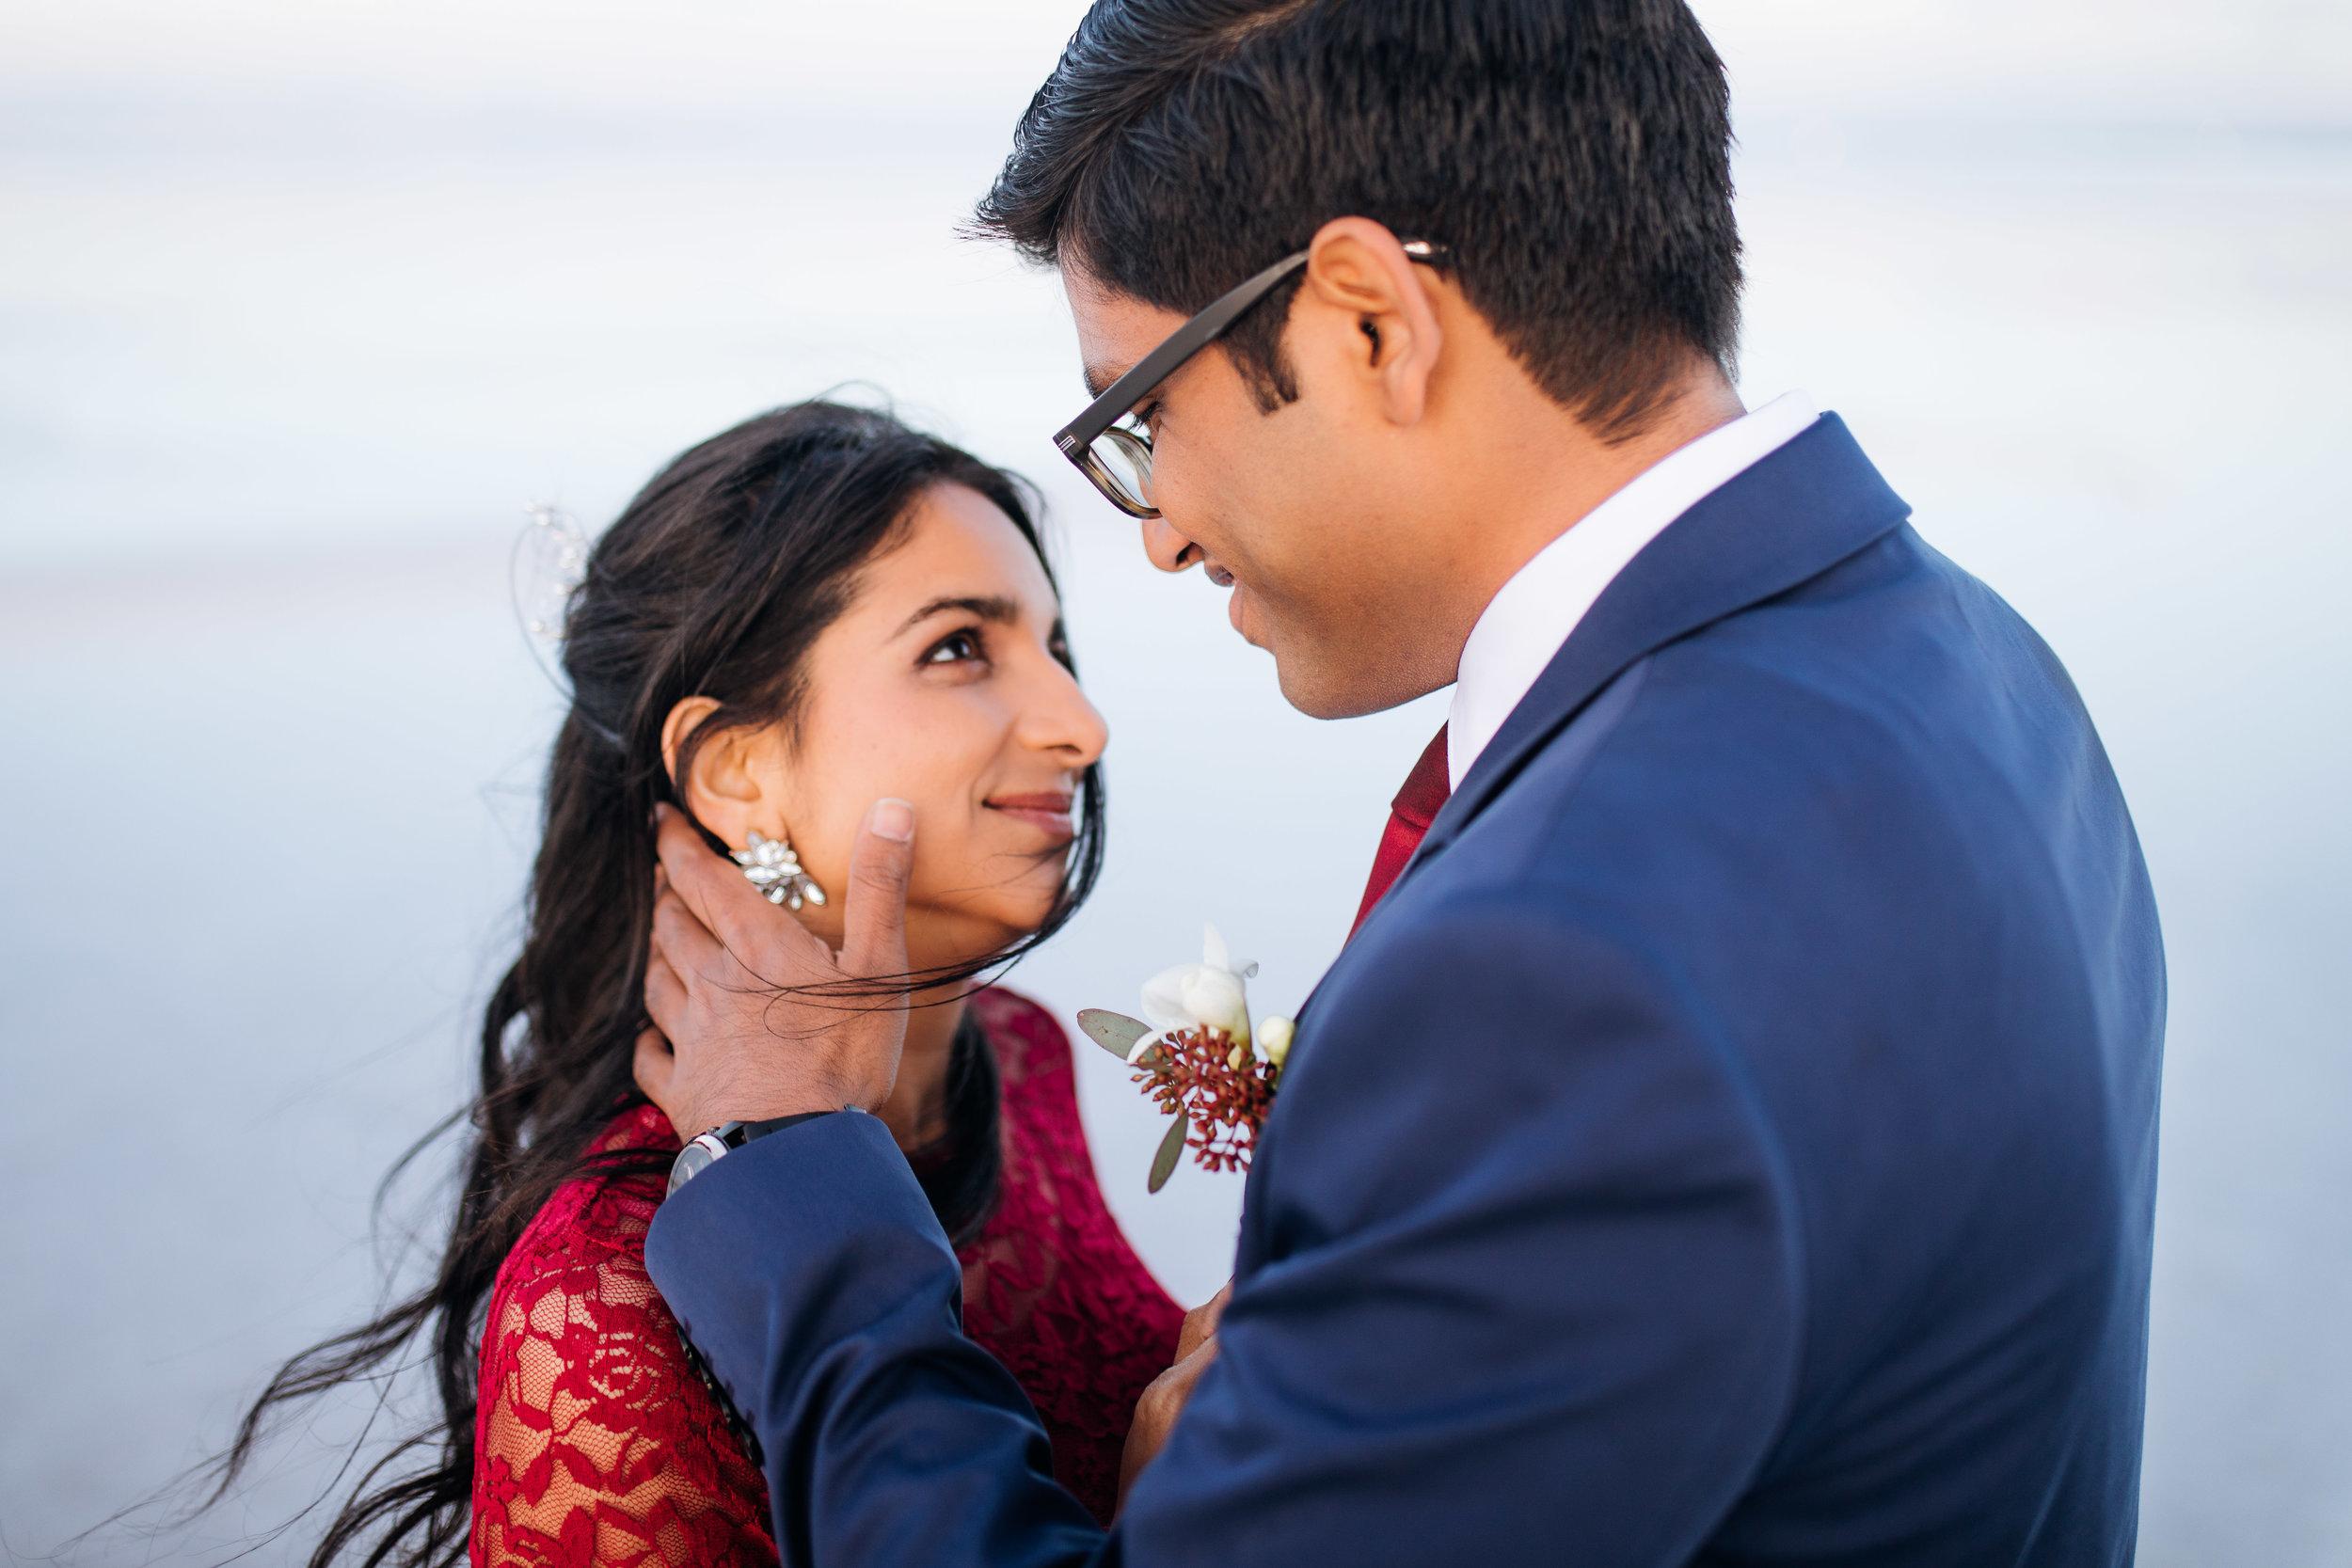 bonneville-salt-flats-engagement-couple-photos-destination-wedding-photography-20.jpg